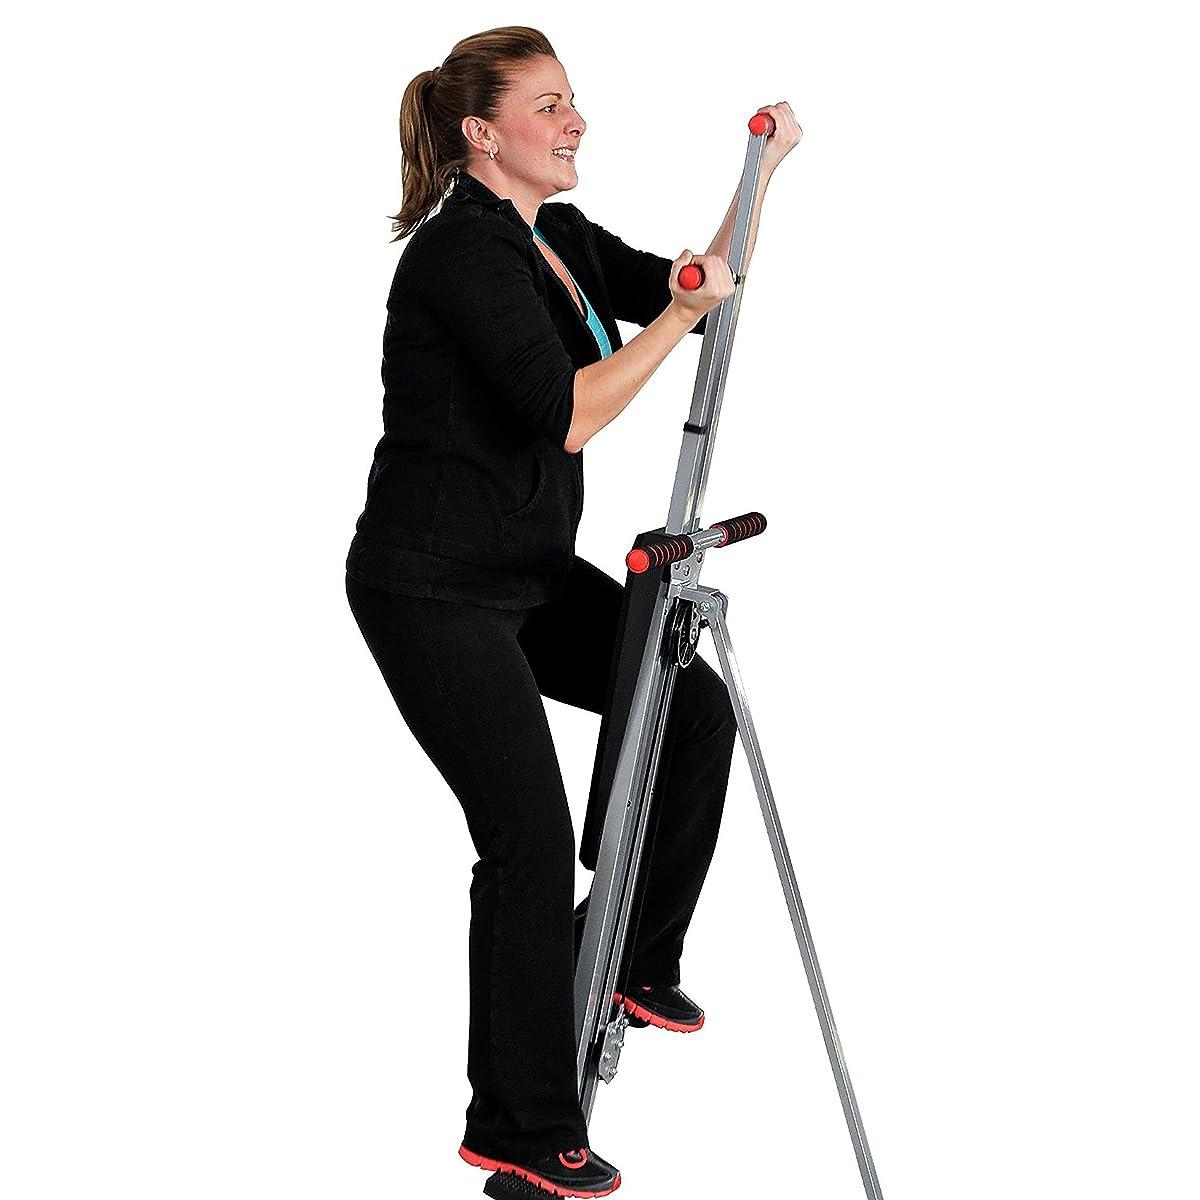 Maxi Climber Exercise Plan To Shape Body